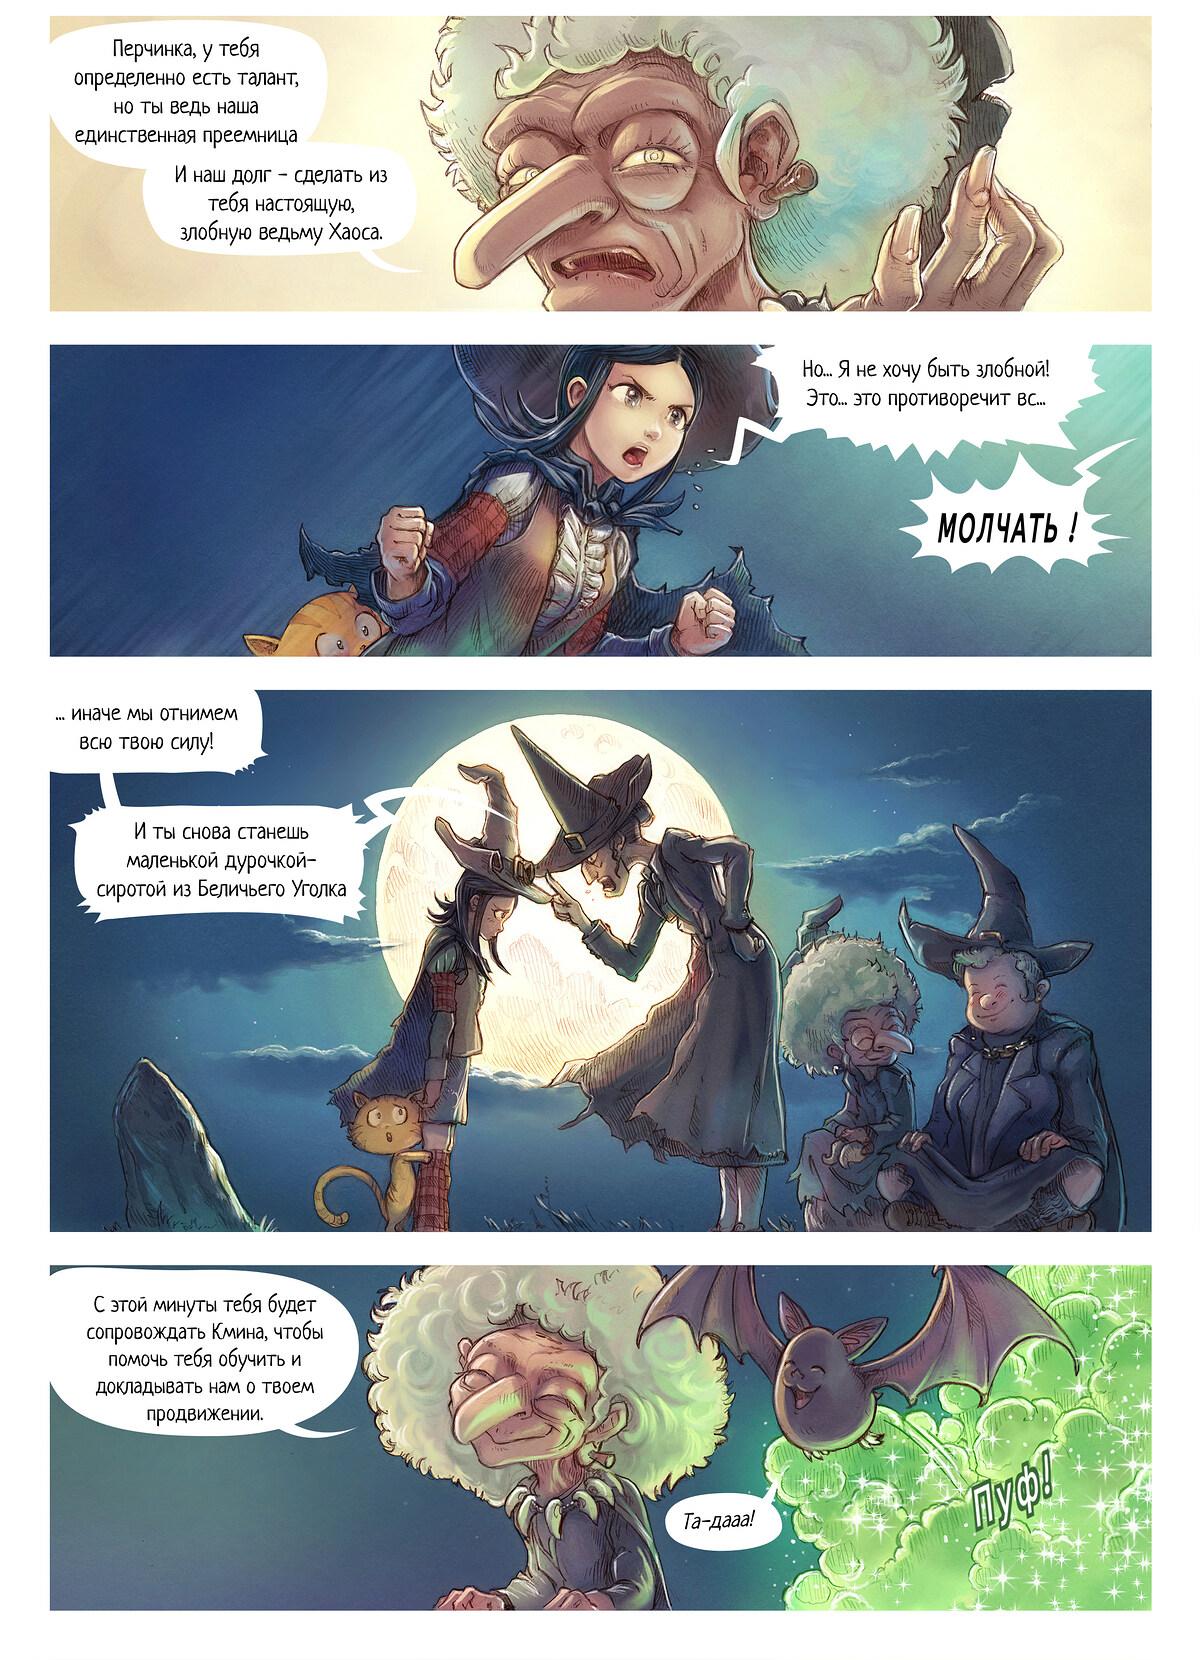 A webcomic page of Pepper&Carrot, эпизод 11 [ru], стр. 2